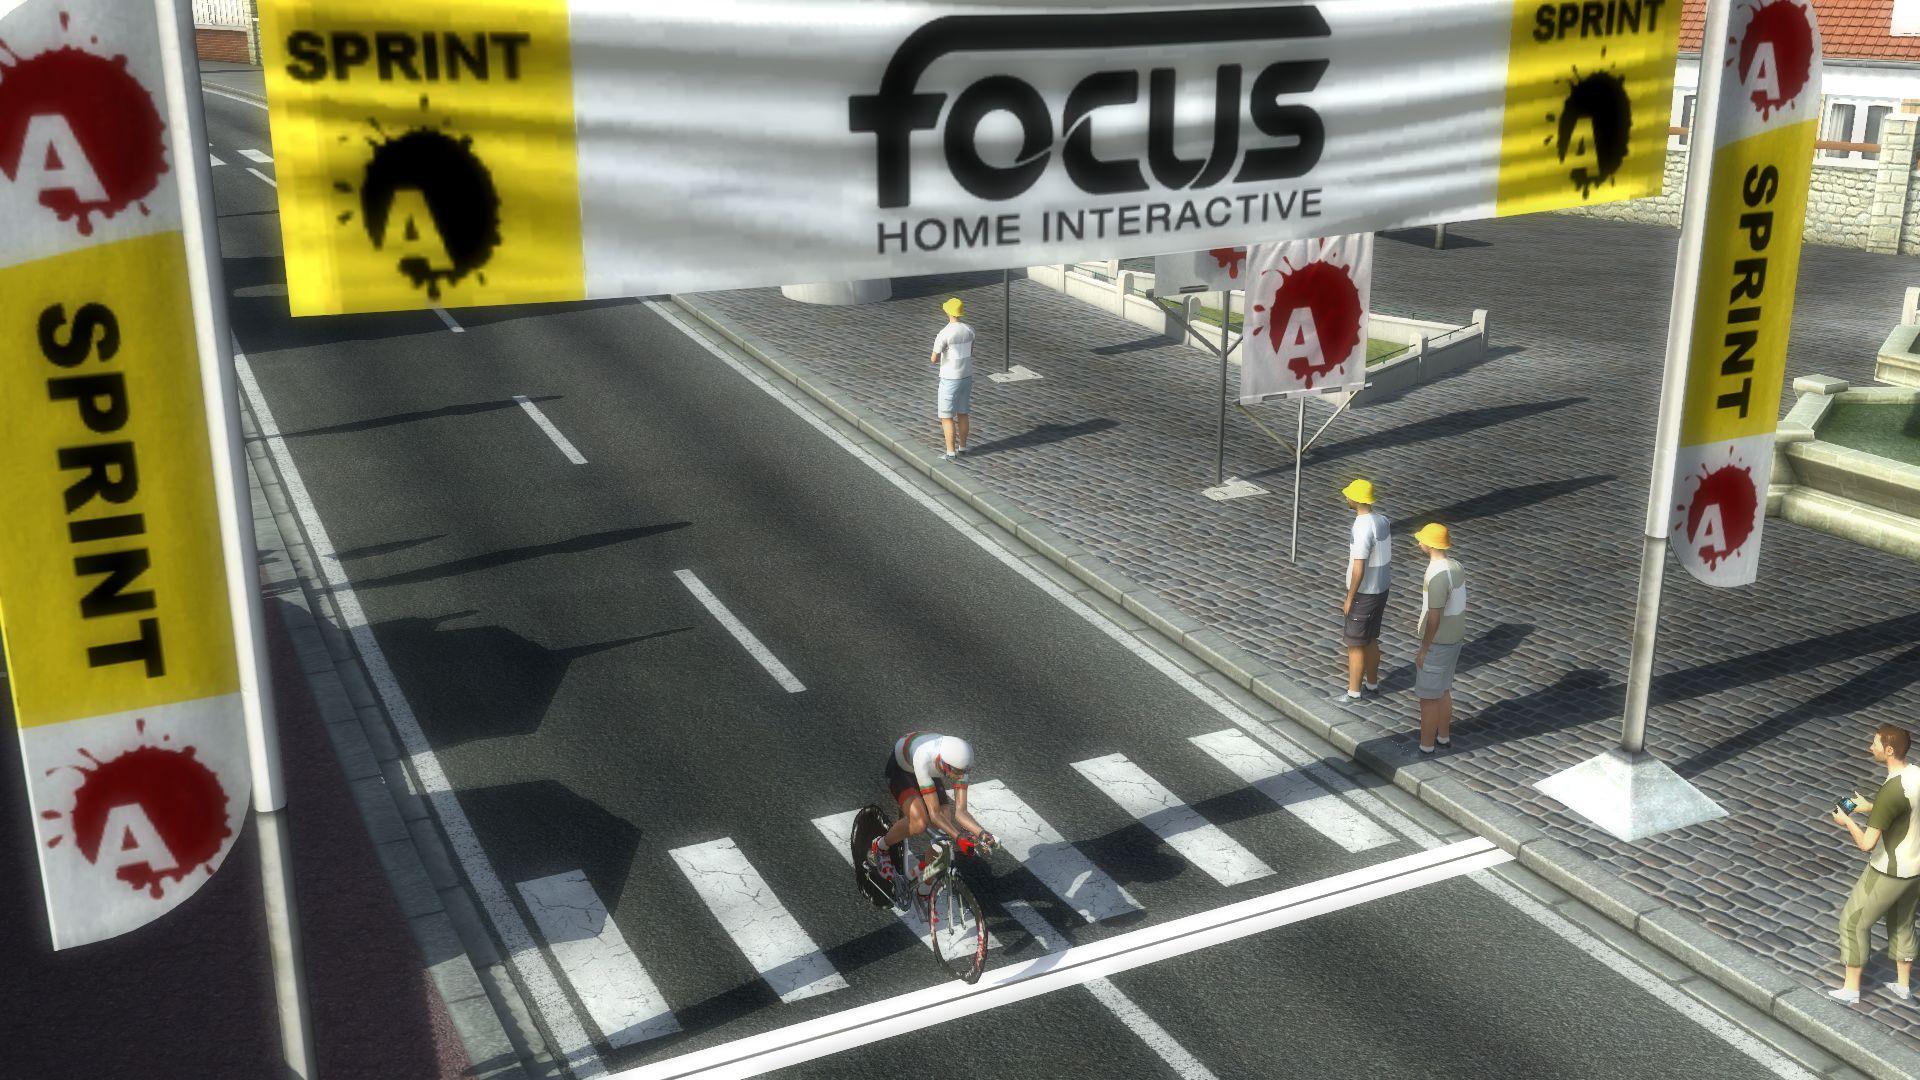 pcmdaily.com/images/mg/2019/Races/C1/Bayern/S4/mg19_bay_s04_34.jpg